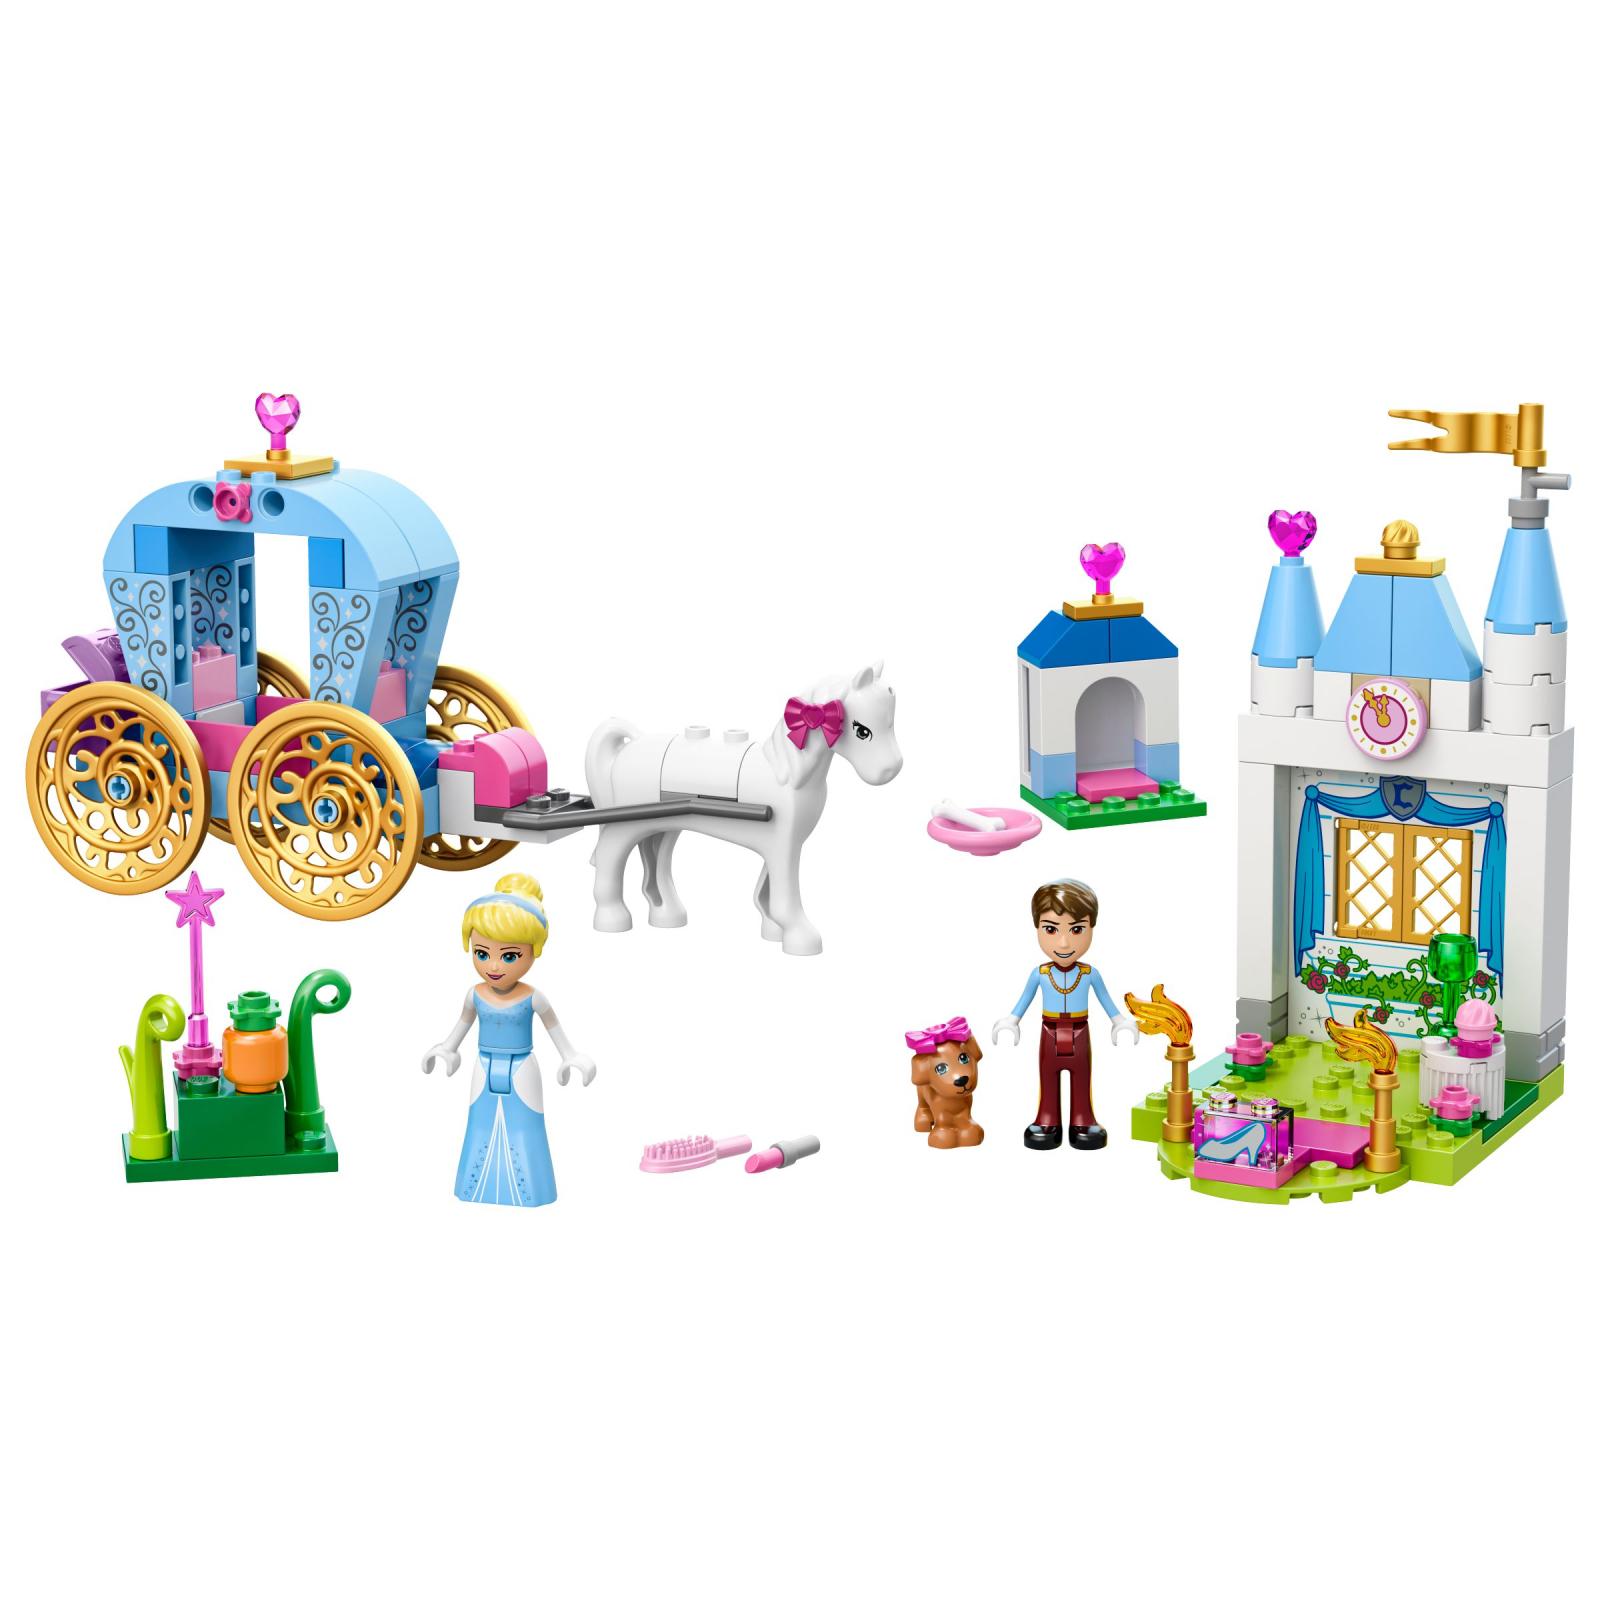 Конструктор LEGO Juniors Карета Золушки (10729) изображение 2